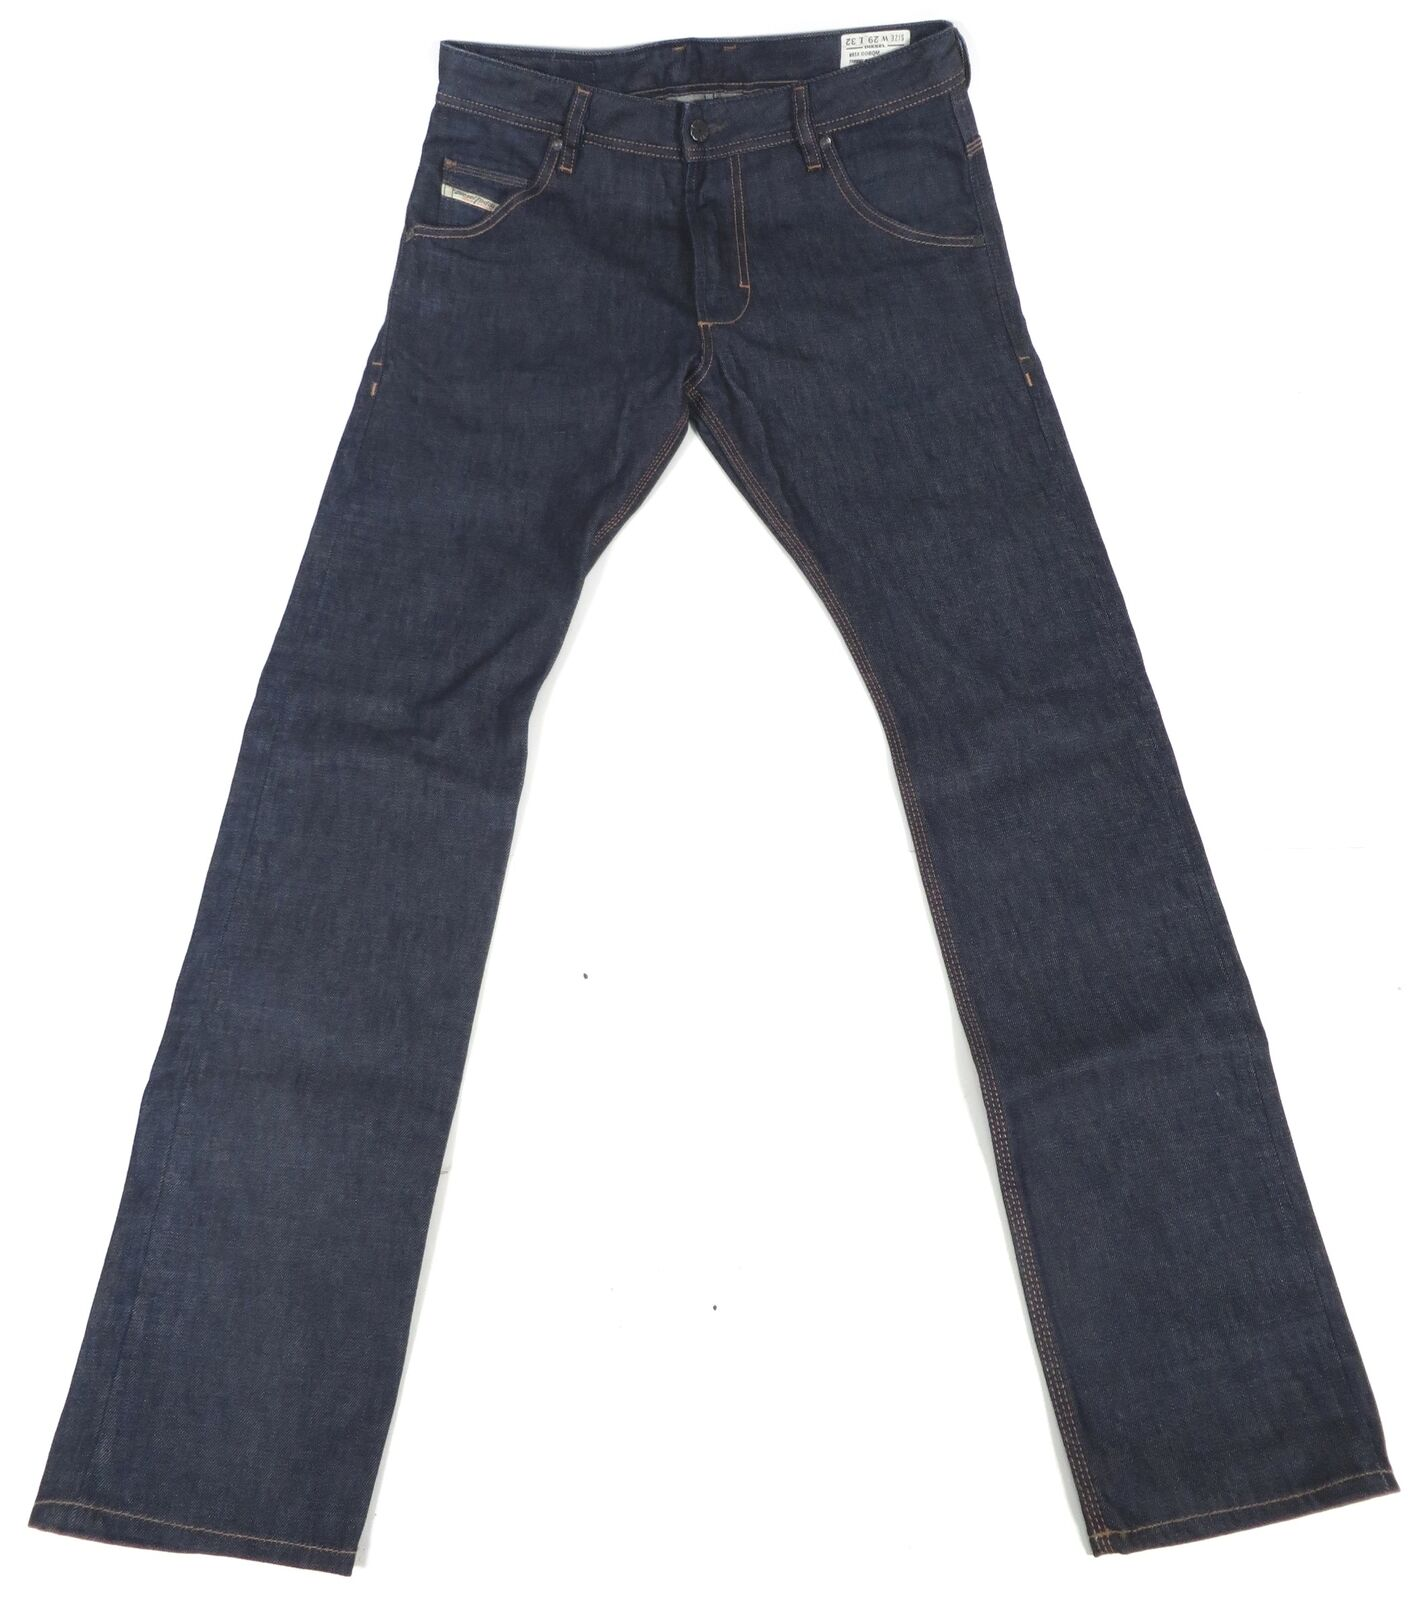 Diesel Turbo Krooley Regular Slim-Carred Designer Jeans 29W 32L Wash 008QM